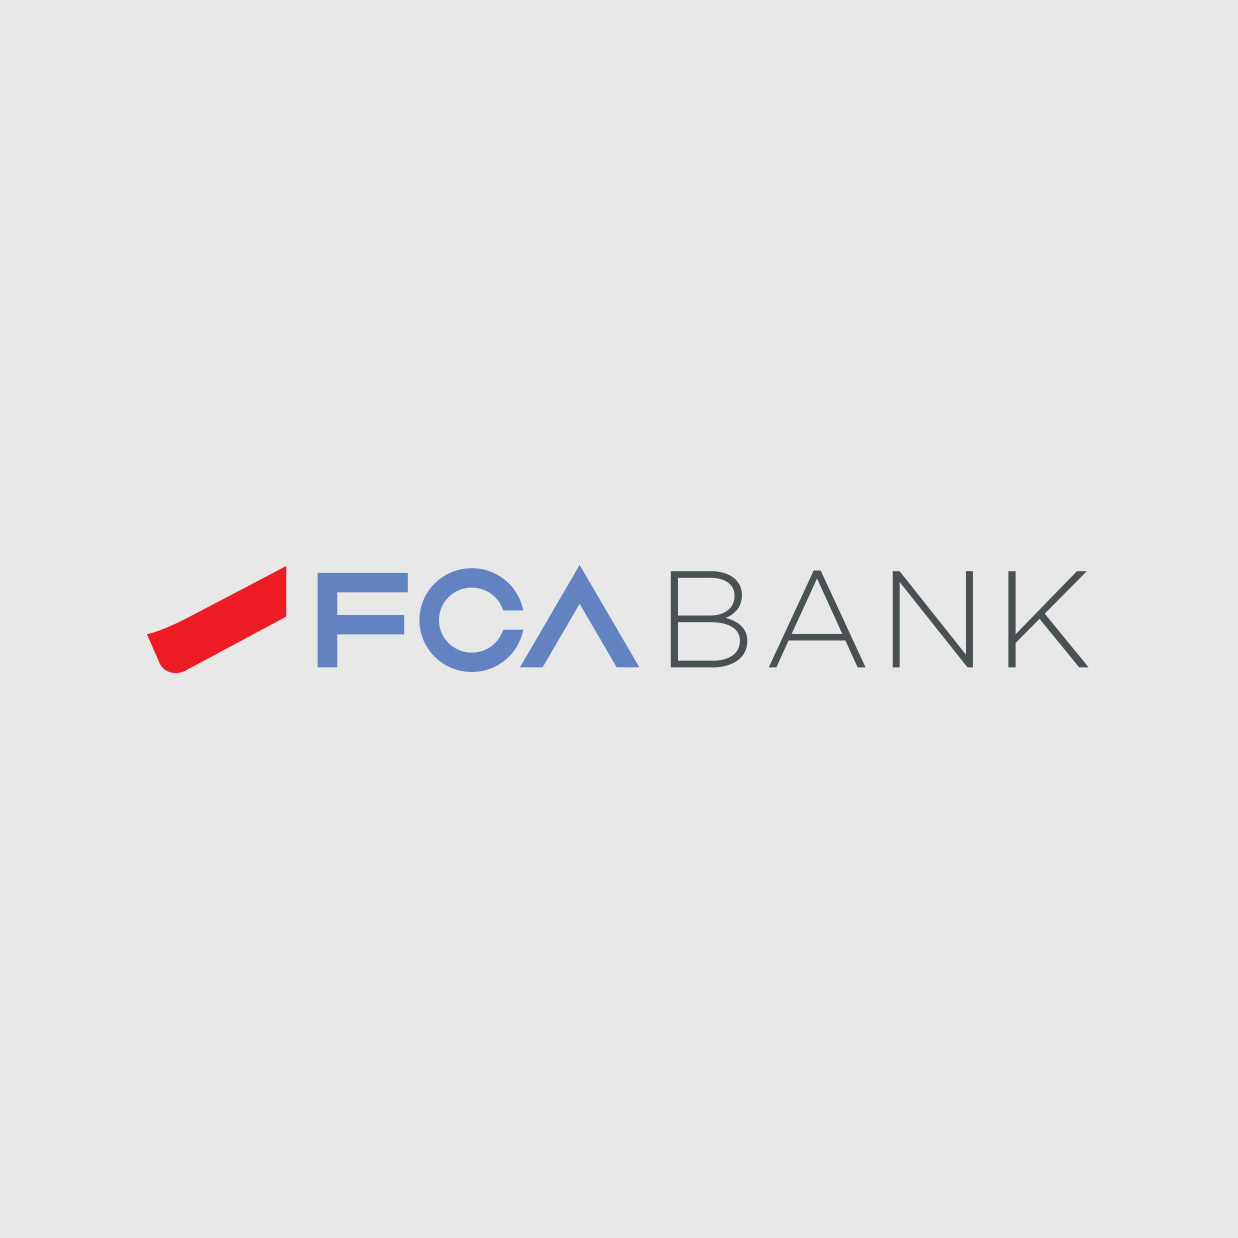 FCA BANK CORPORATE